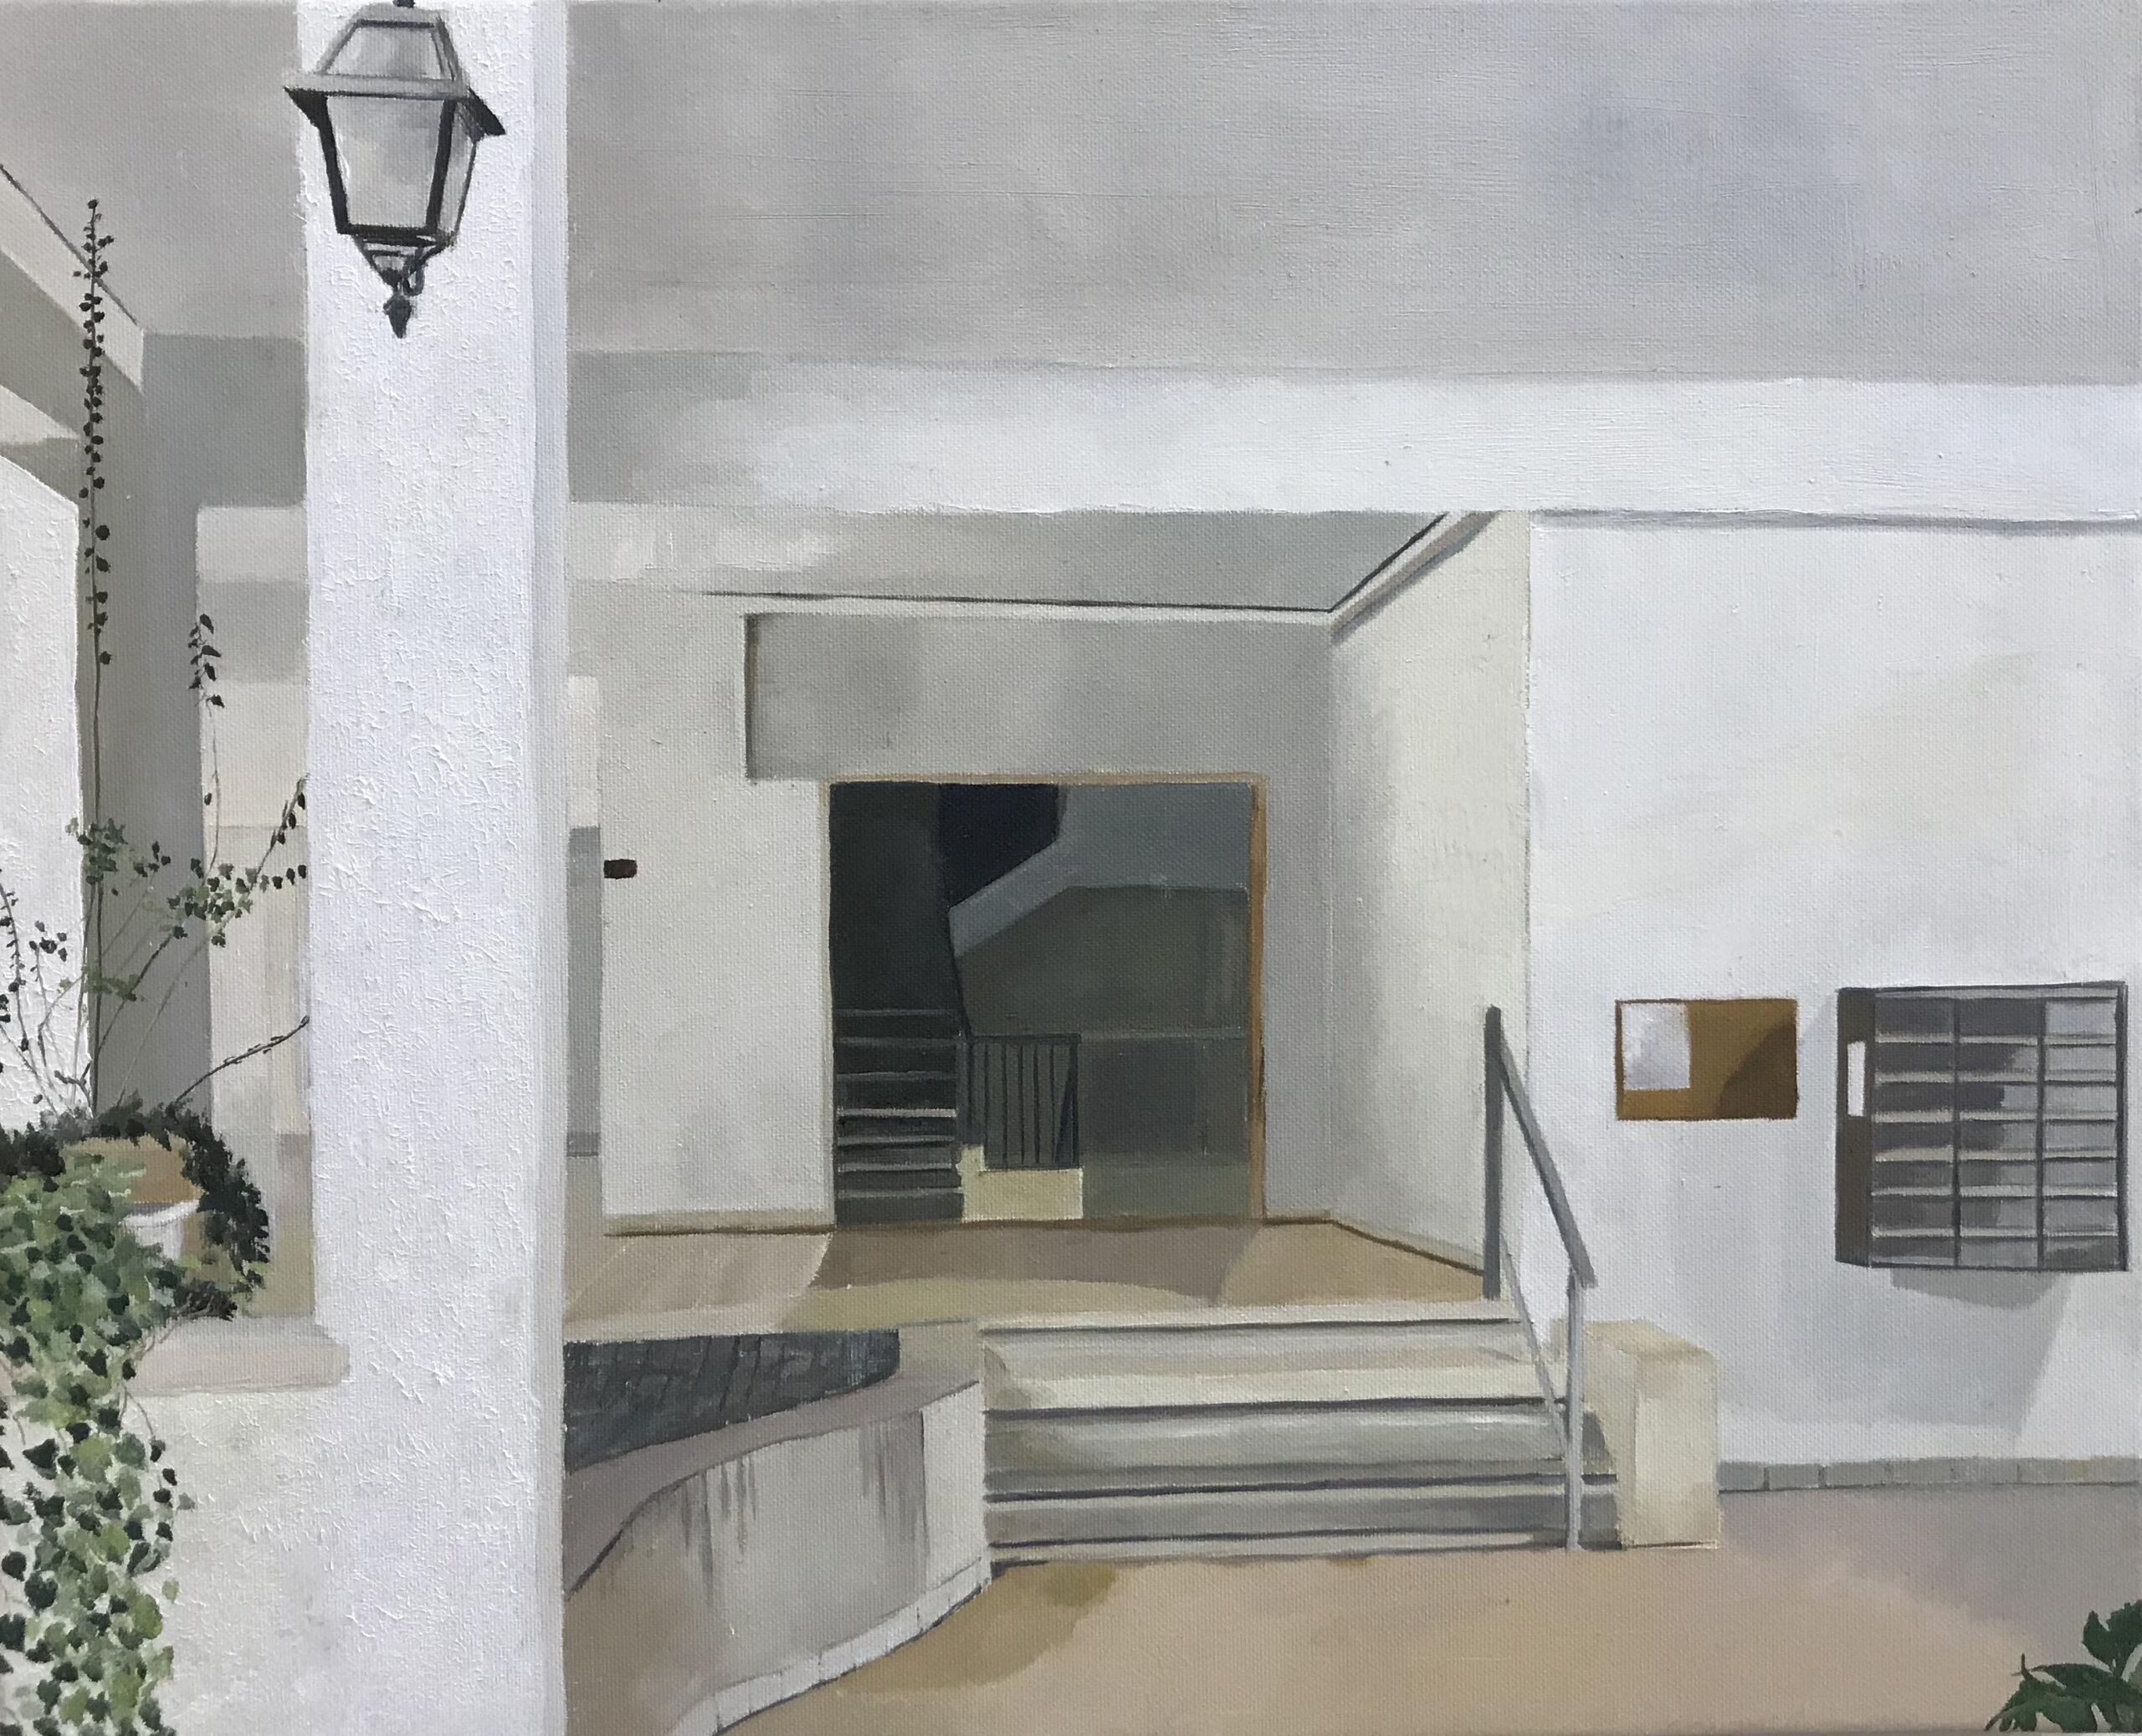 Tel Aviv, Entrance. Zohar Flax. Jackson's Painting Prize.